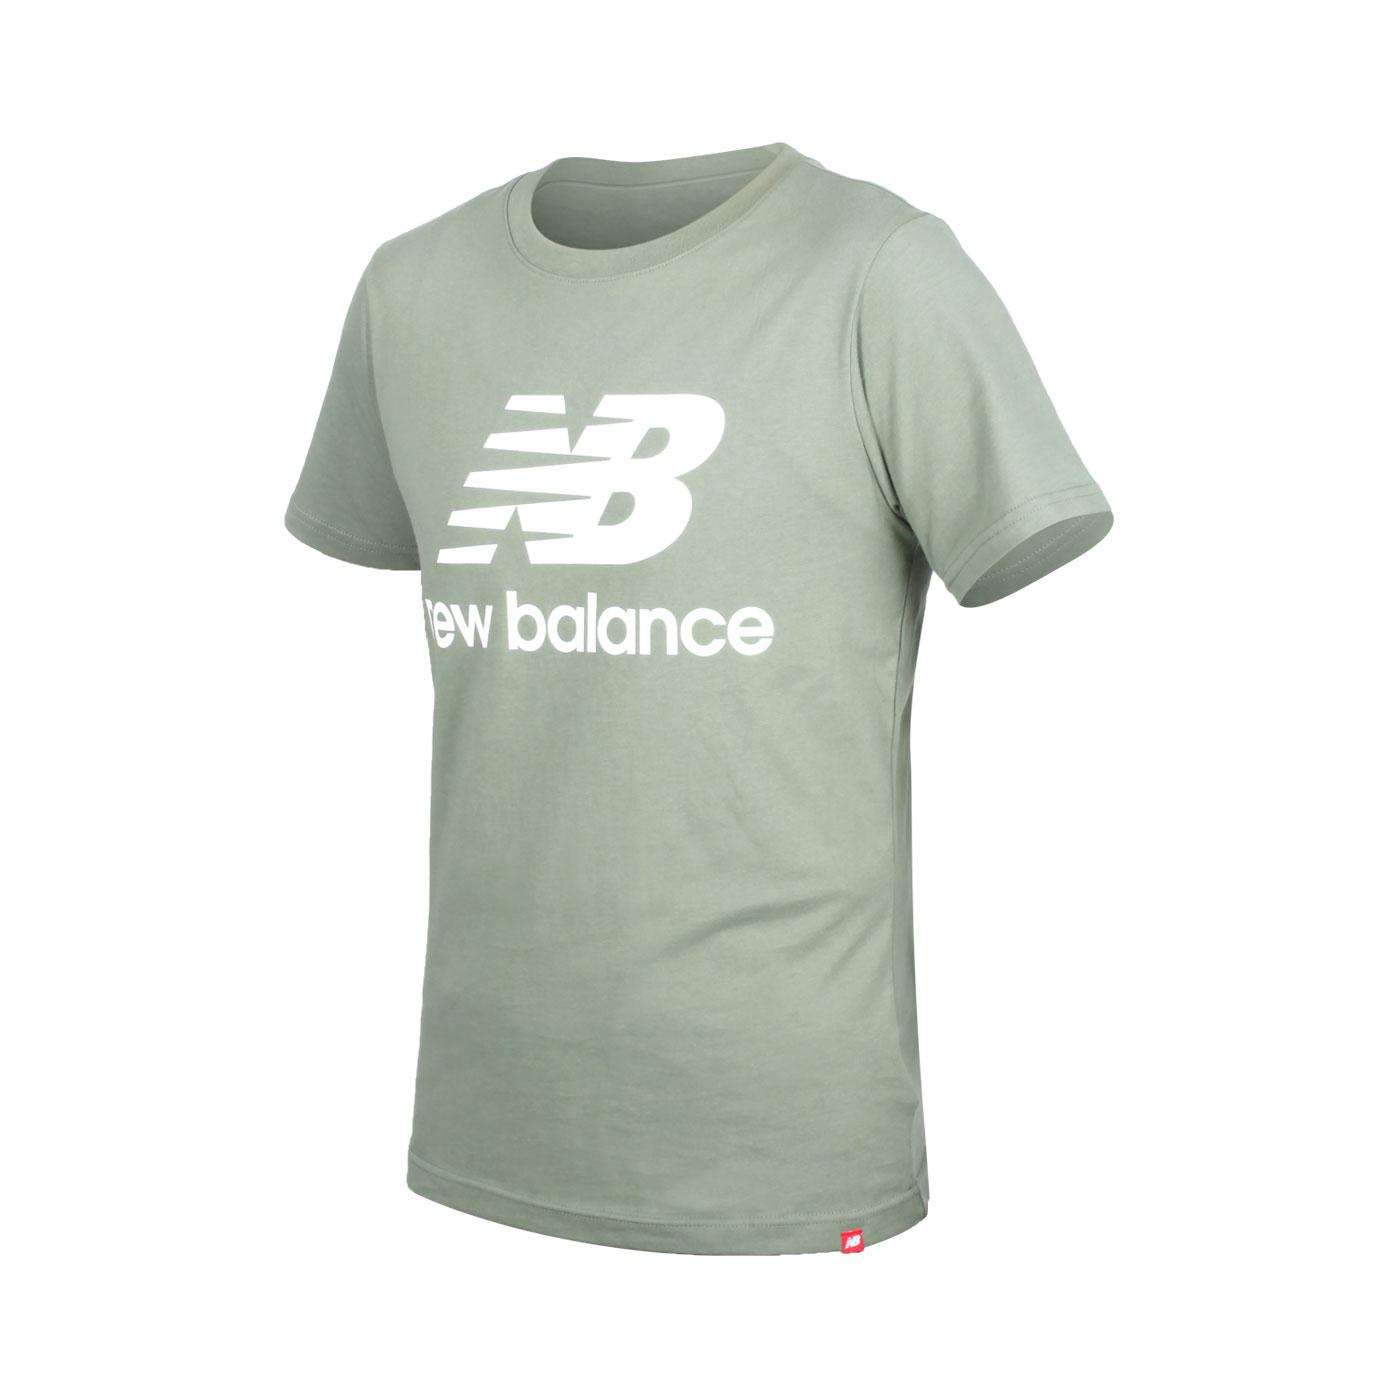 NEW BALANCE 男款短袖T恤 AMT01575CEL - 綠白